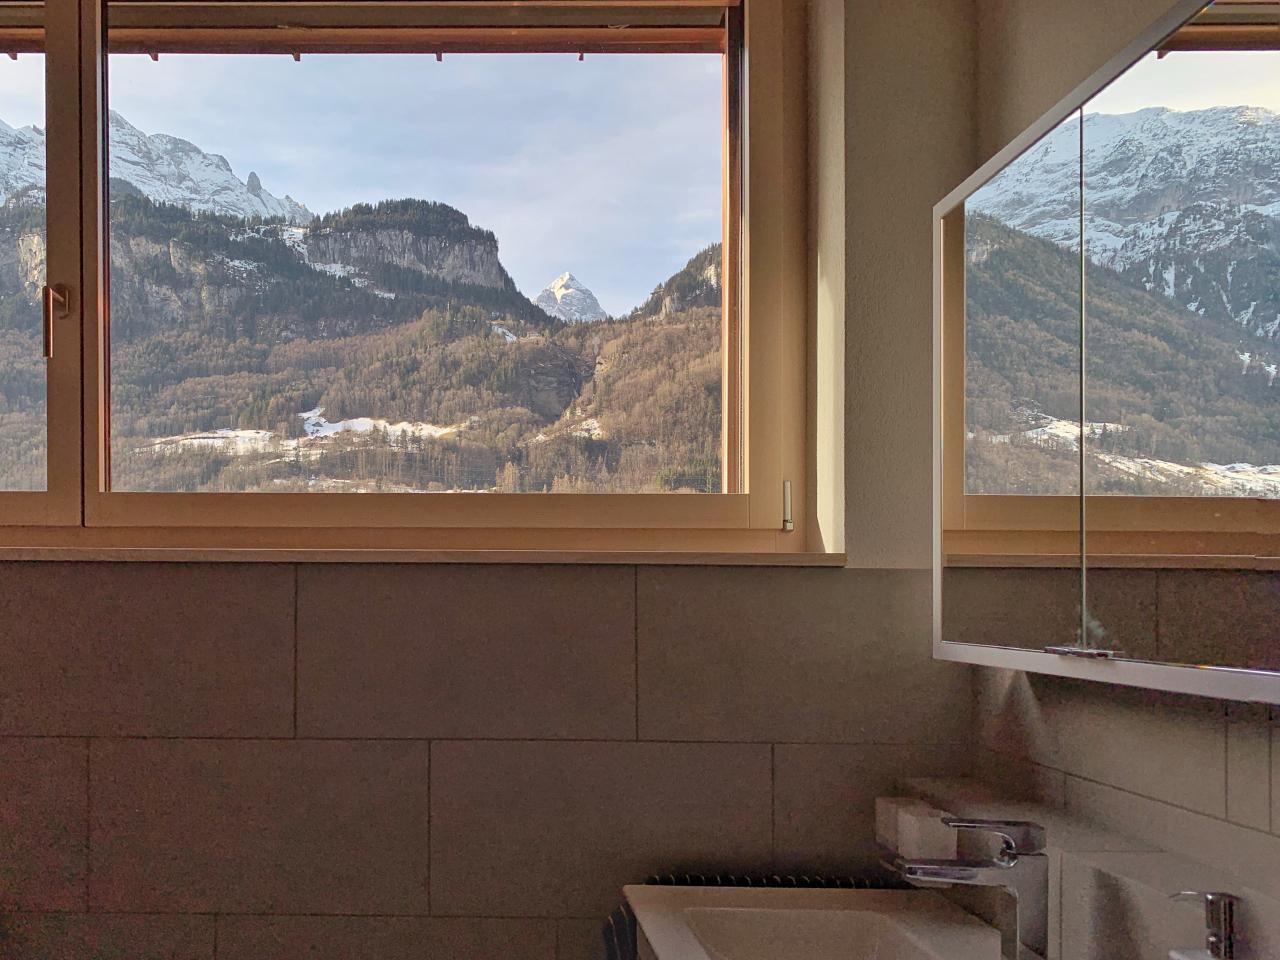 Ferienwohnung Mountain 4U (2605720), Meiringen, Meiringen - Hasliberg, Berner Oberland, Schweiz, Bild 13